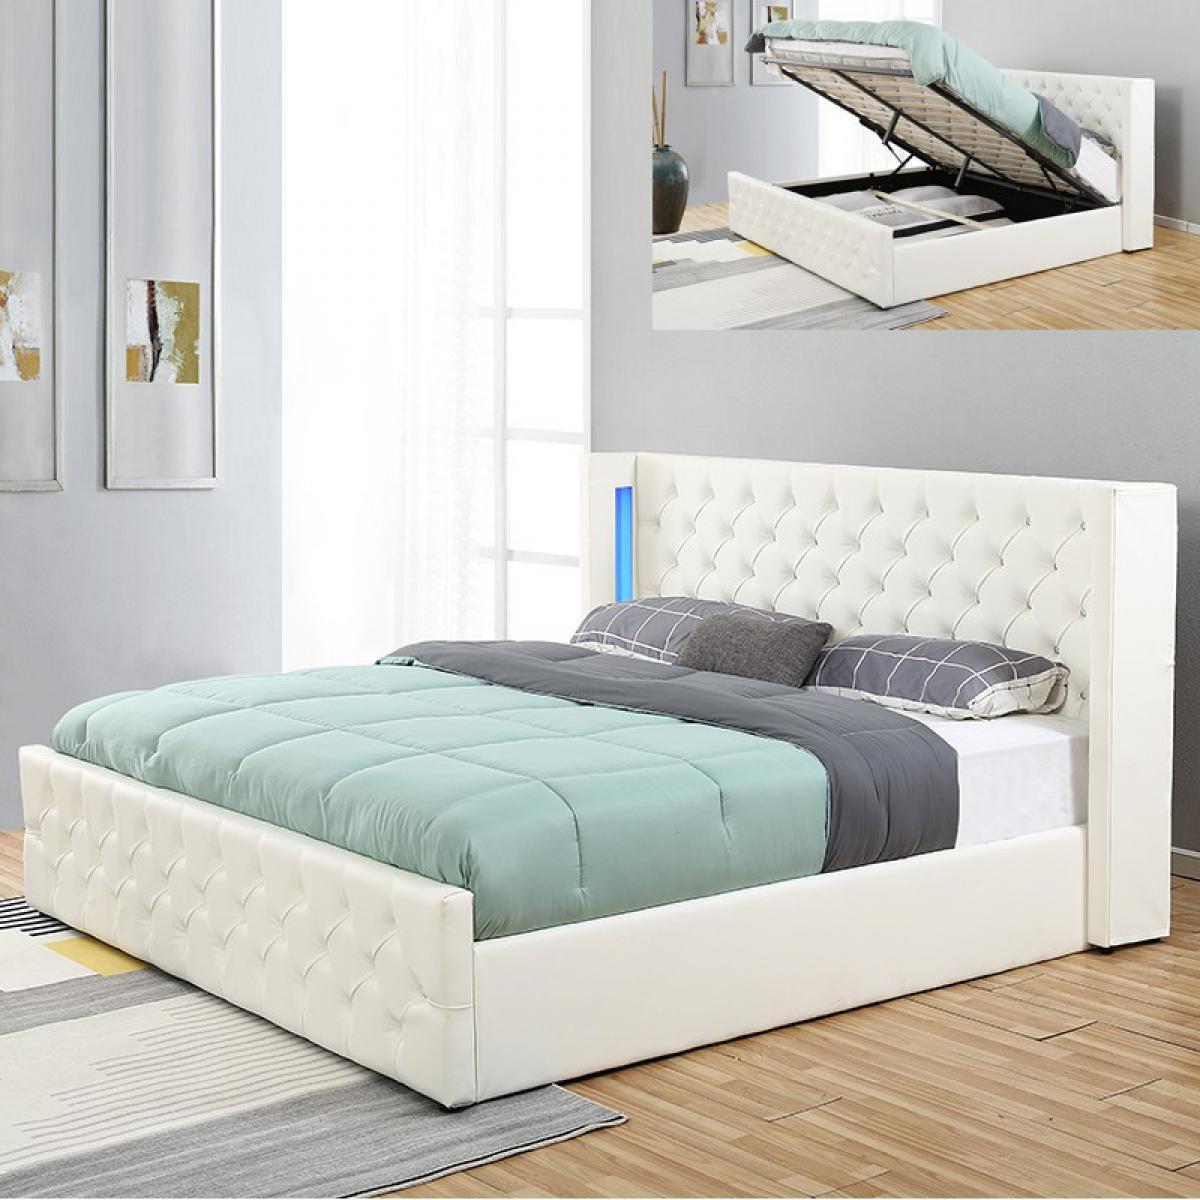 Meubler Design Lit coffre design avec led OSMOS - Blanc - 140x190